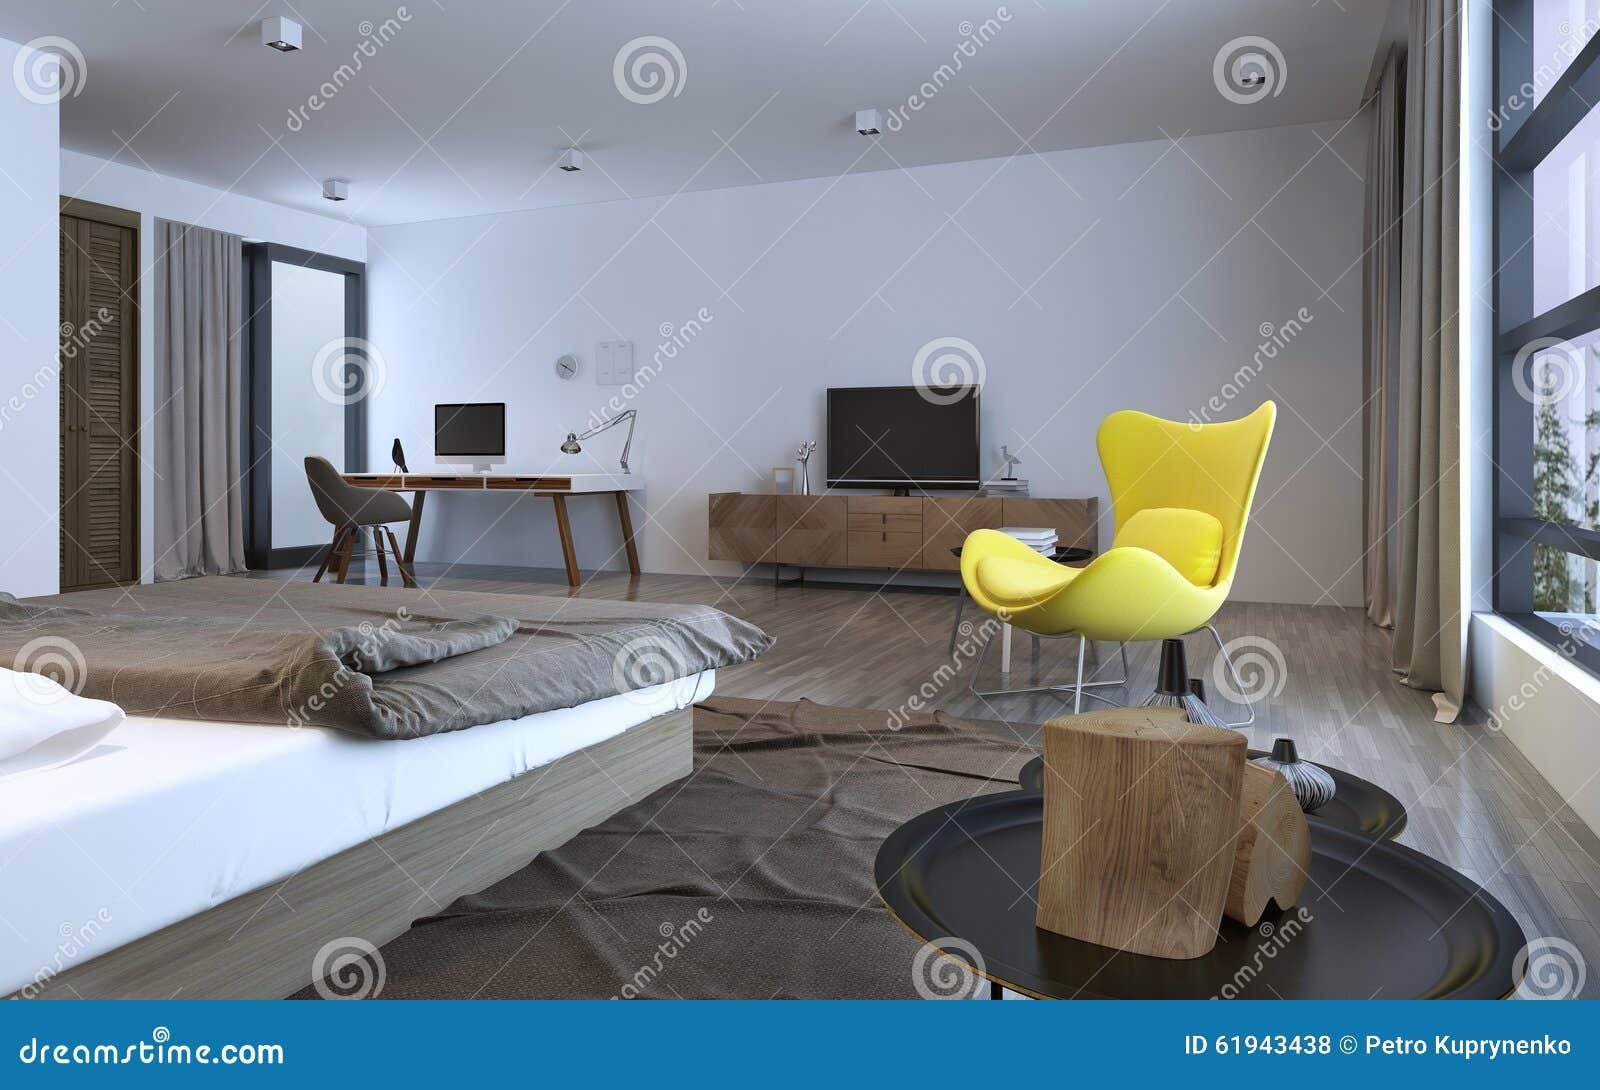 Bedroom Idea Minimalist Interior Stock Illustration